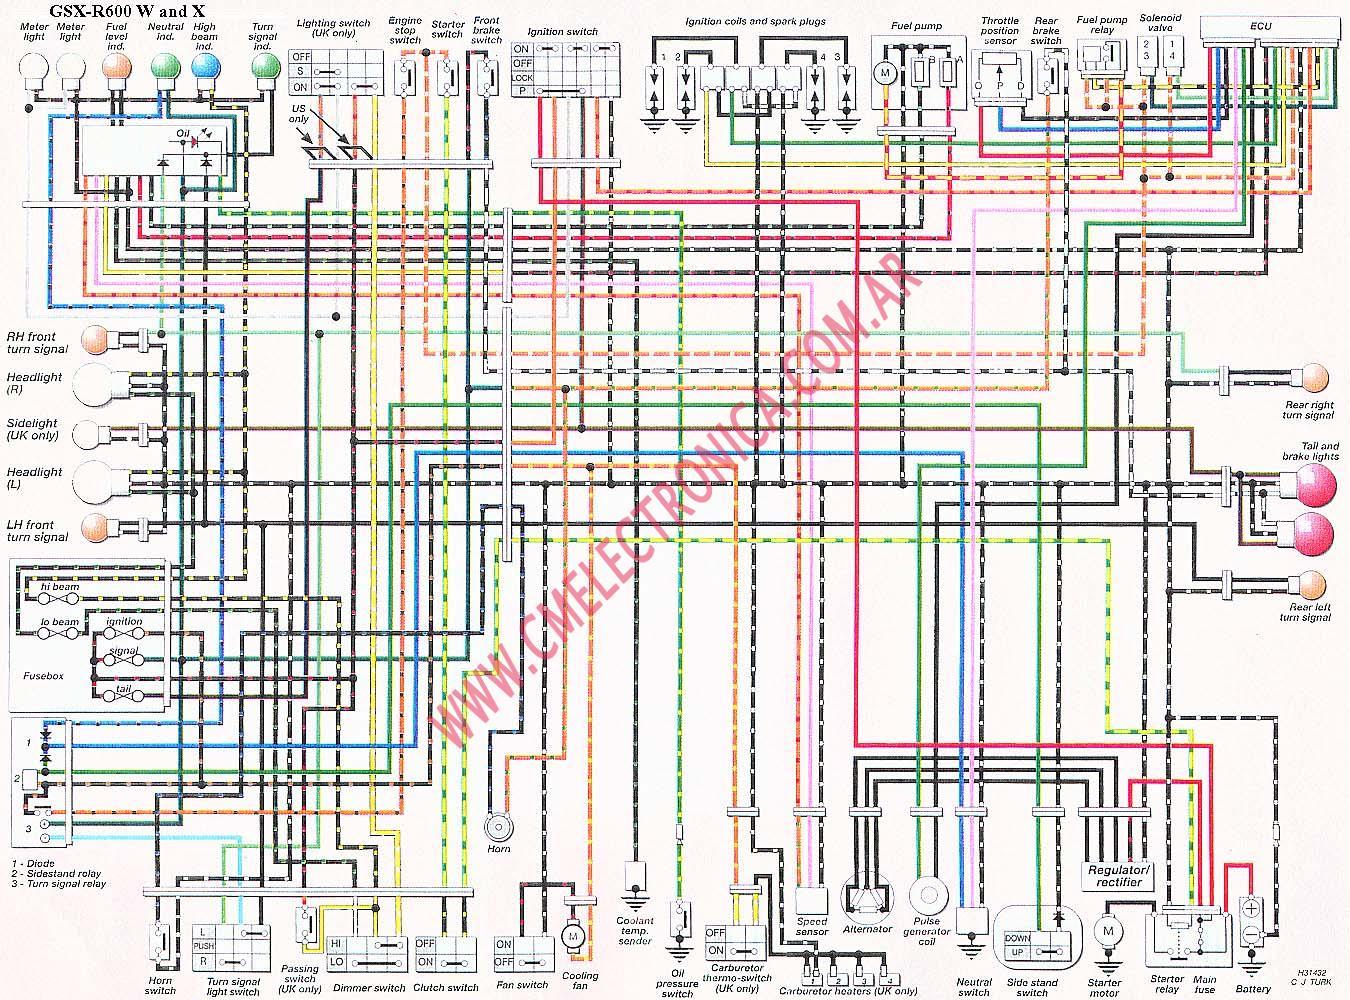 2007 suzuki ltr 450 wiring diagram bargman lights 2000 gsxr 750 schematic all data on a 600 cafe racer simple